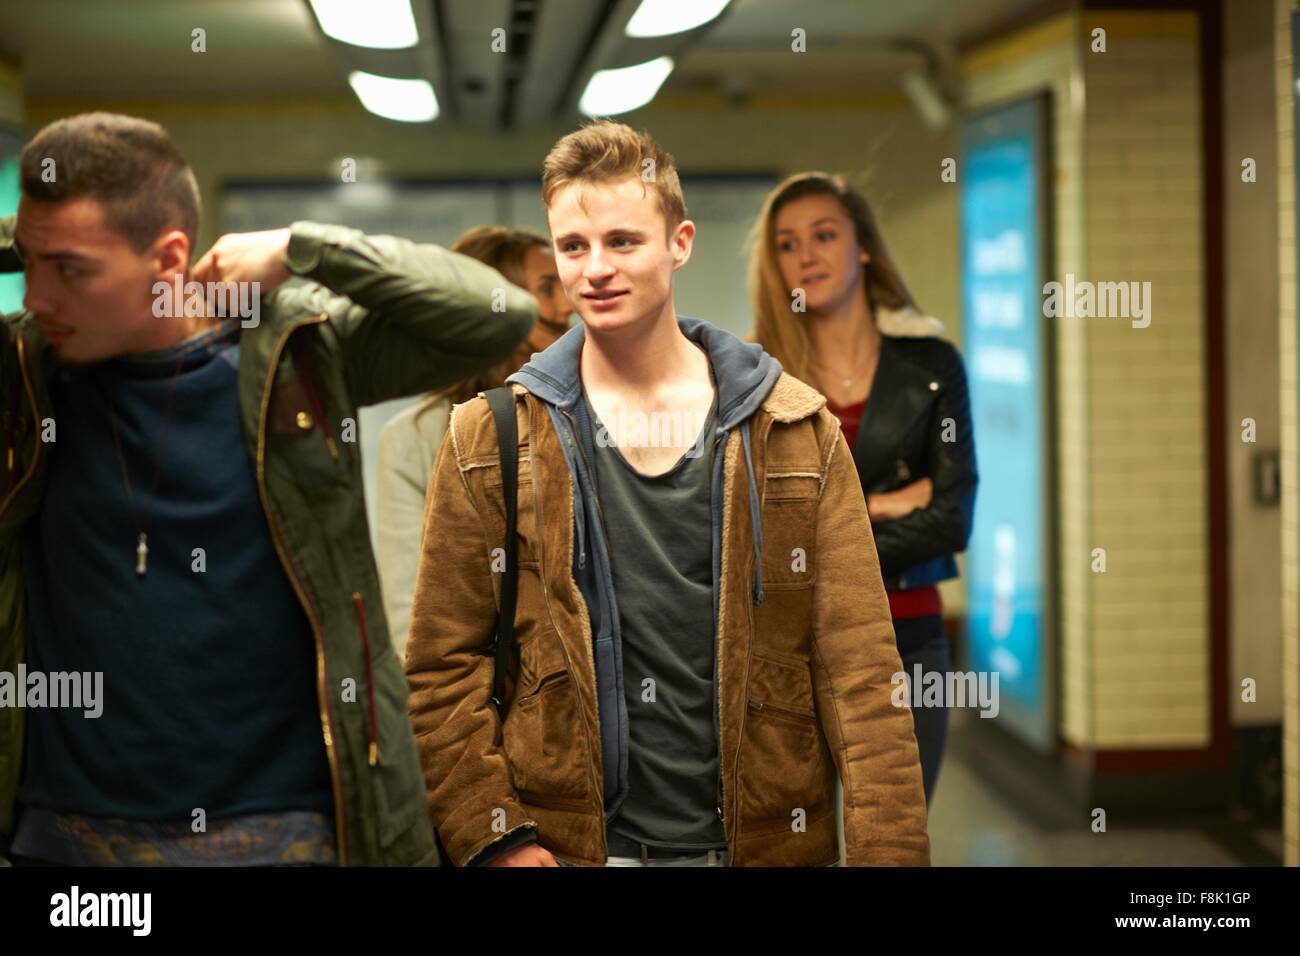 Vier junge Erwachsene Freunde Spaziergang durch London u-Bahnhaltestelle, London, UK Stockbild